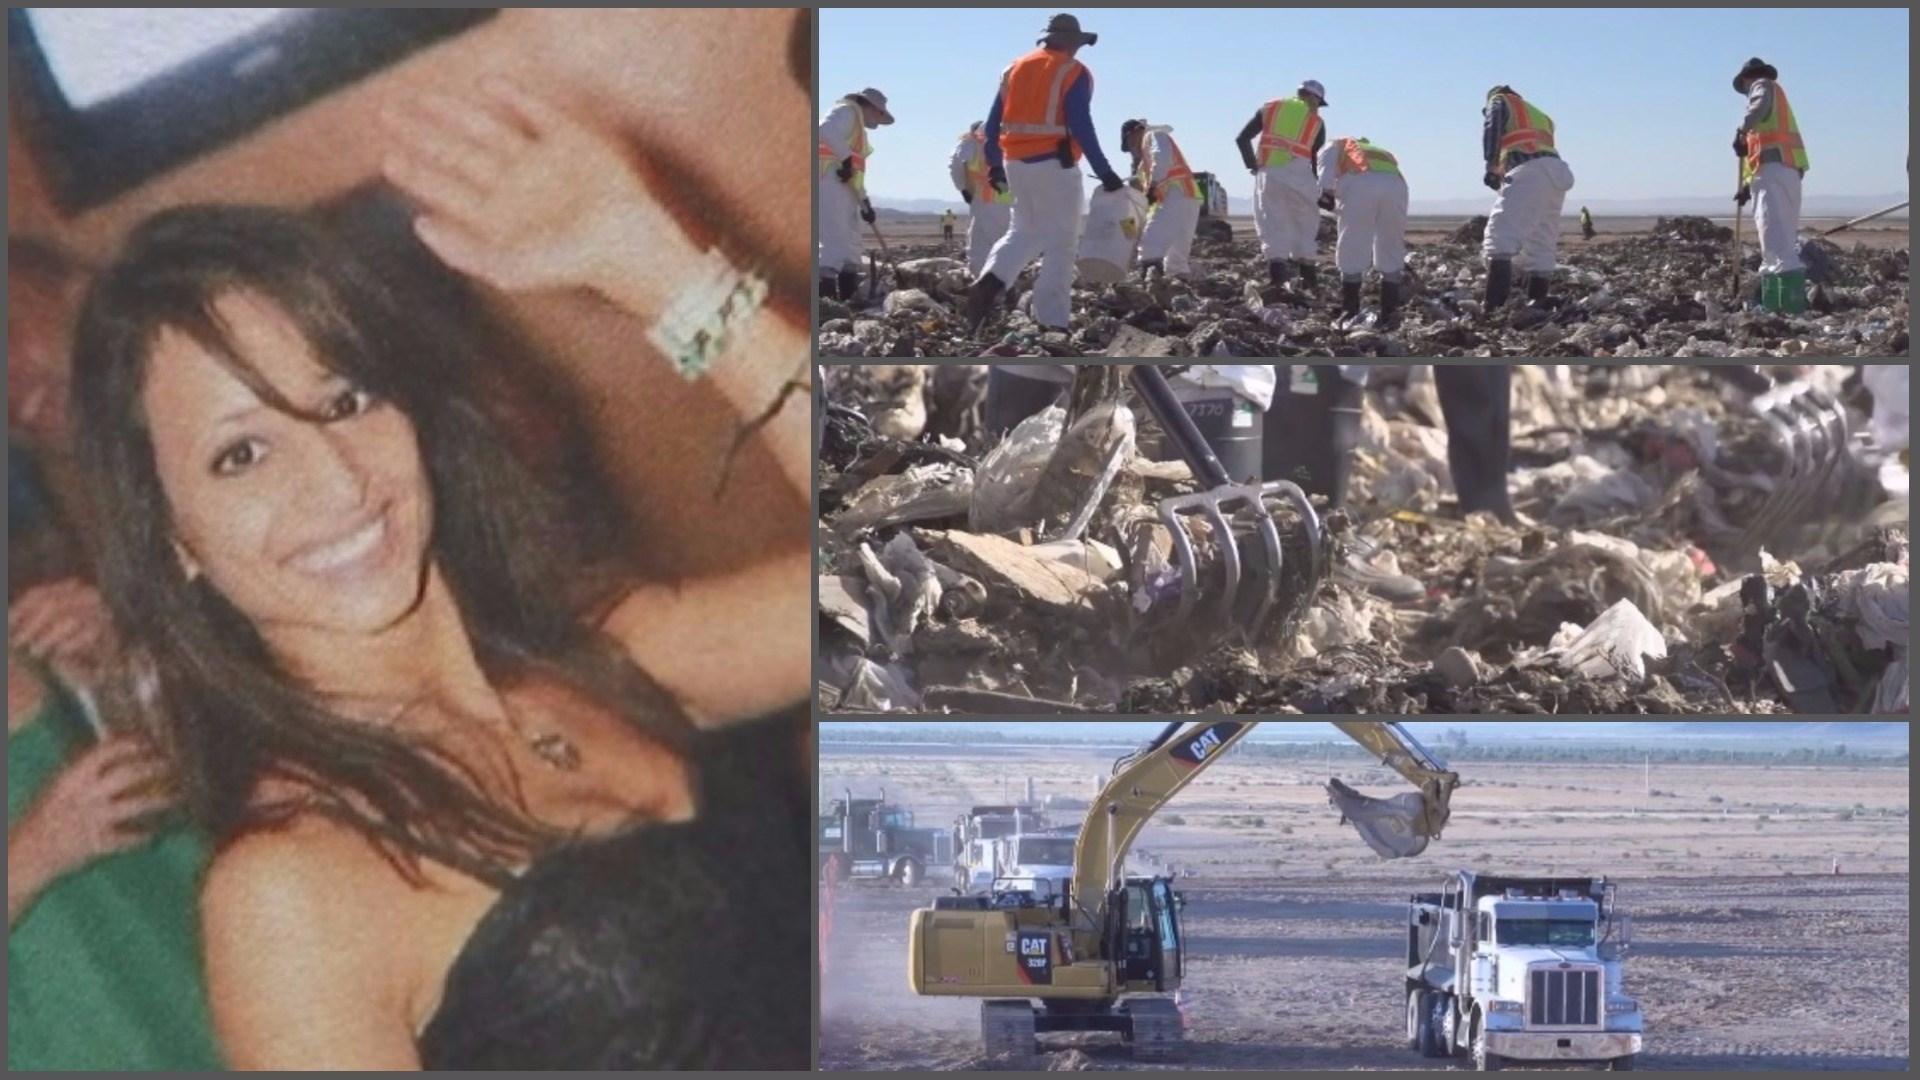 Christine Mustafa Case Police Search Landfill For Missing Arizona Mom S Body Cbs News